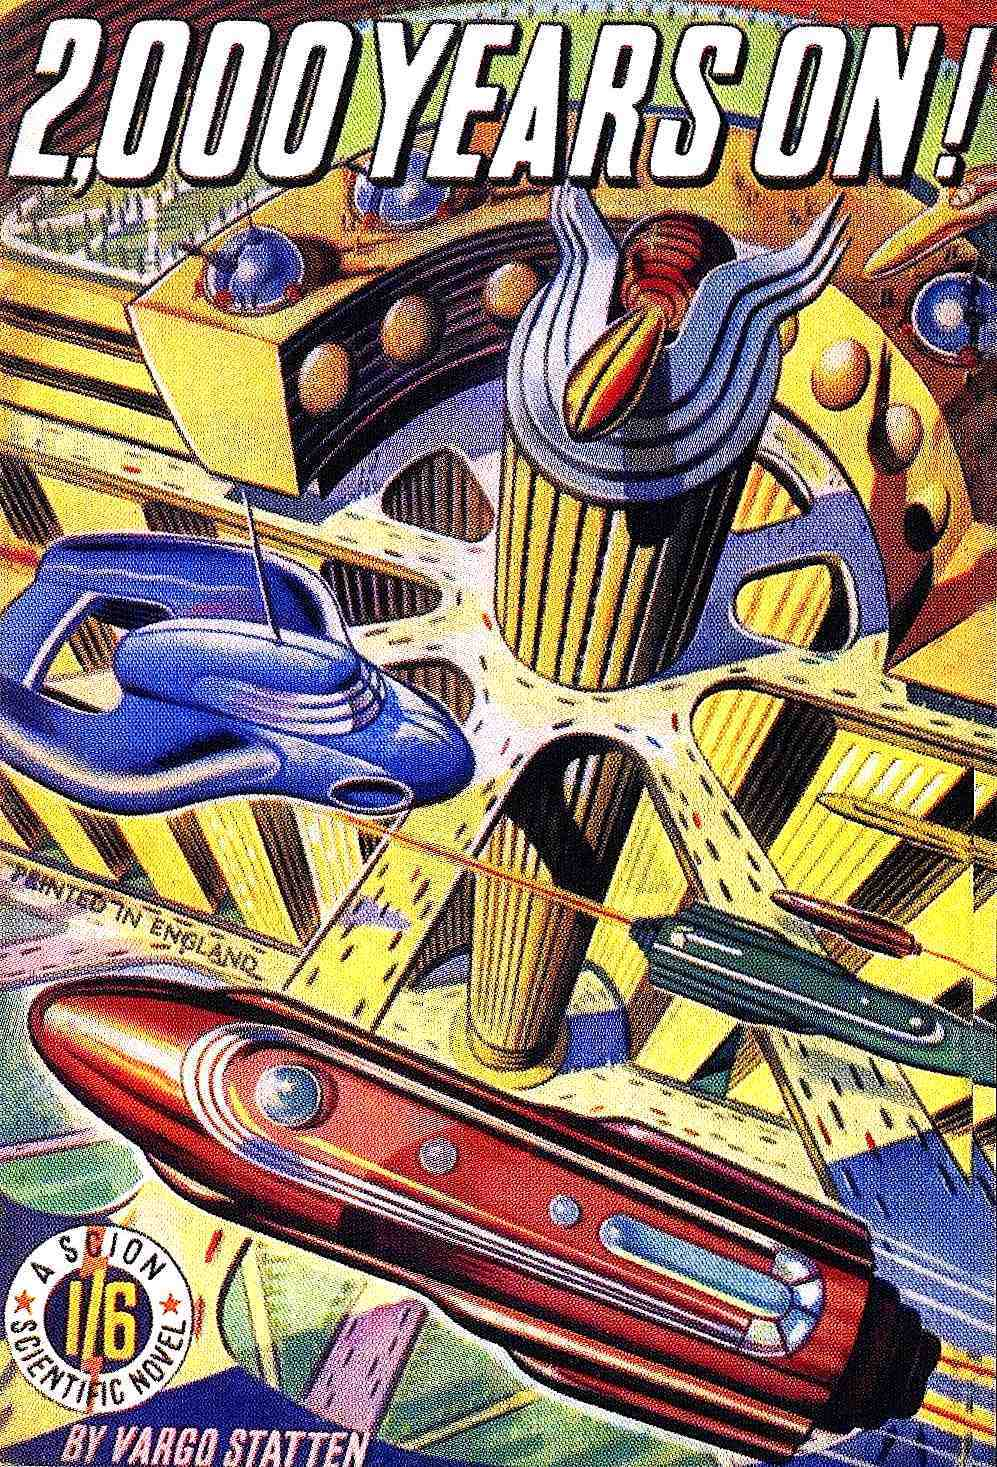 retro-future birdseye illustration